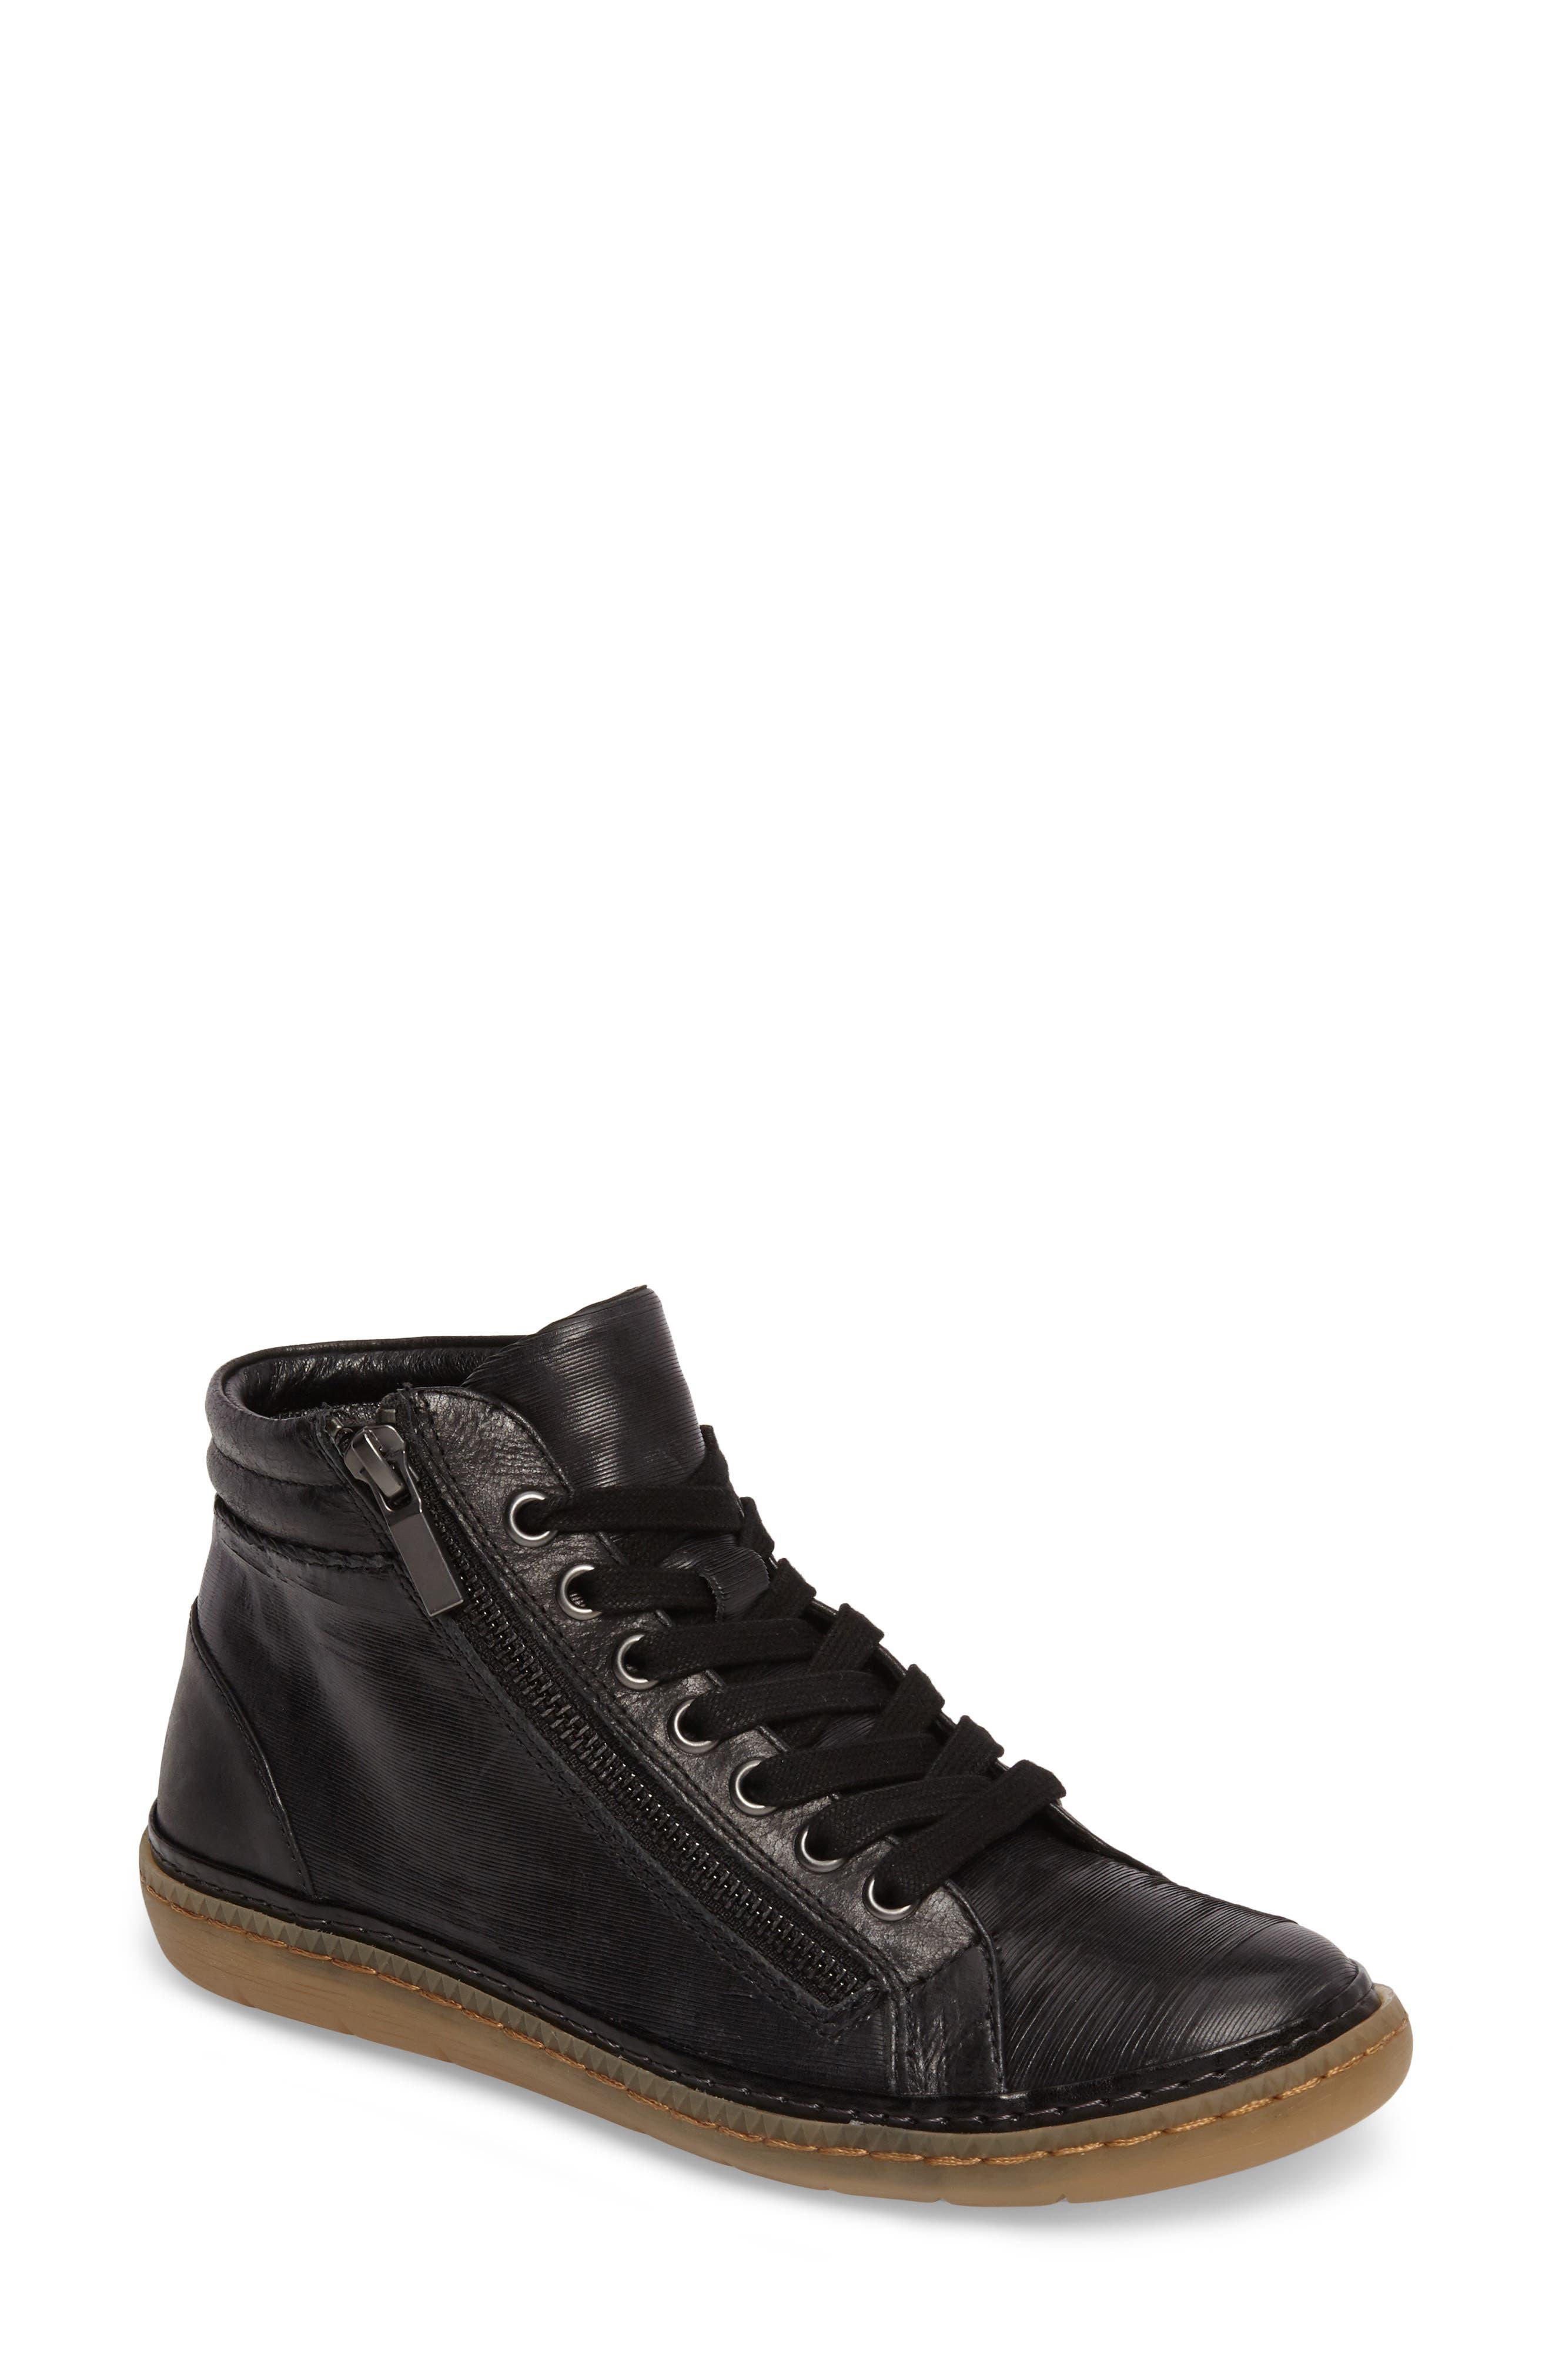 Annaleigh High Top Sneaker,                             Main thumbnail 1, color,                             001